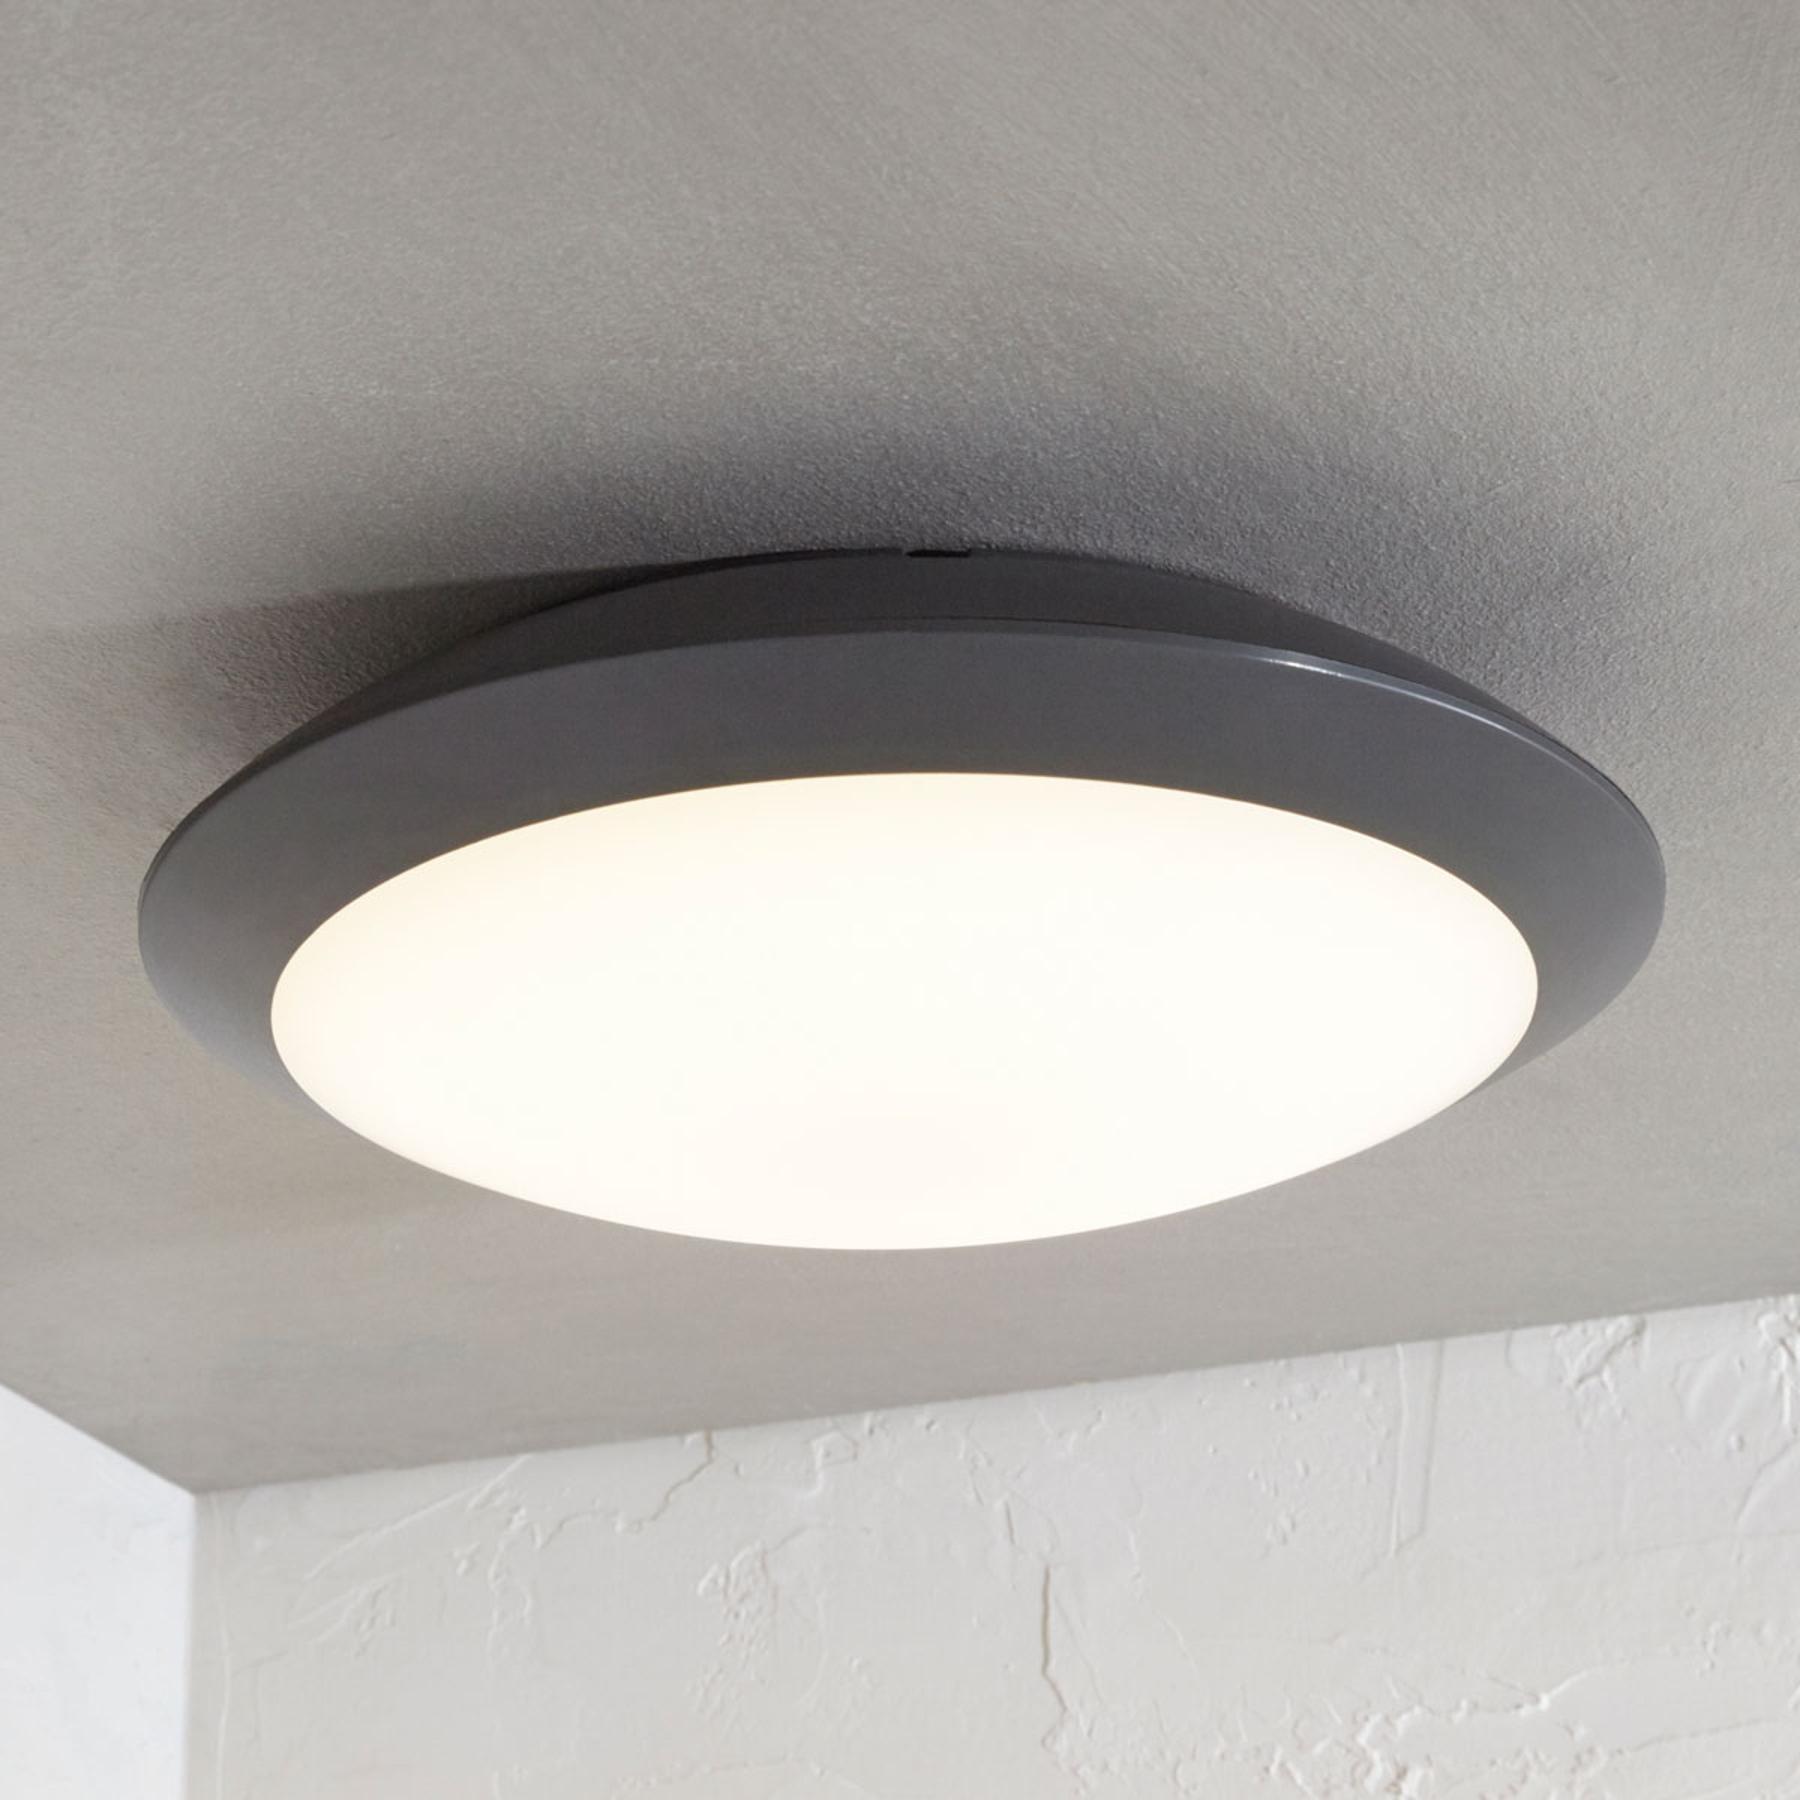 Lampa sufitowa LED Naira szara, bez czujnika